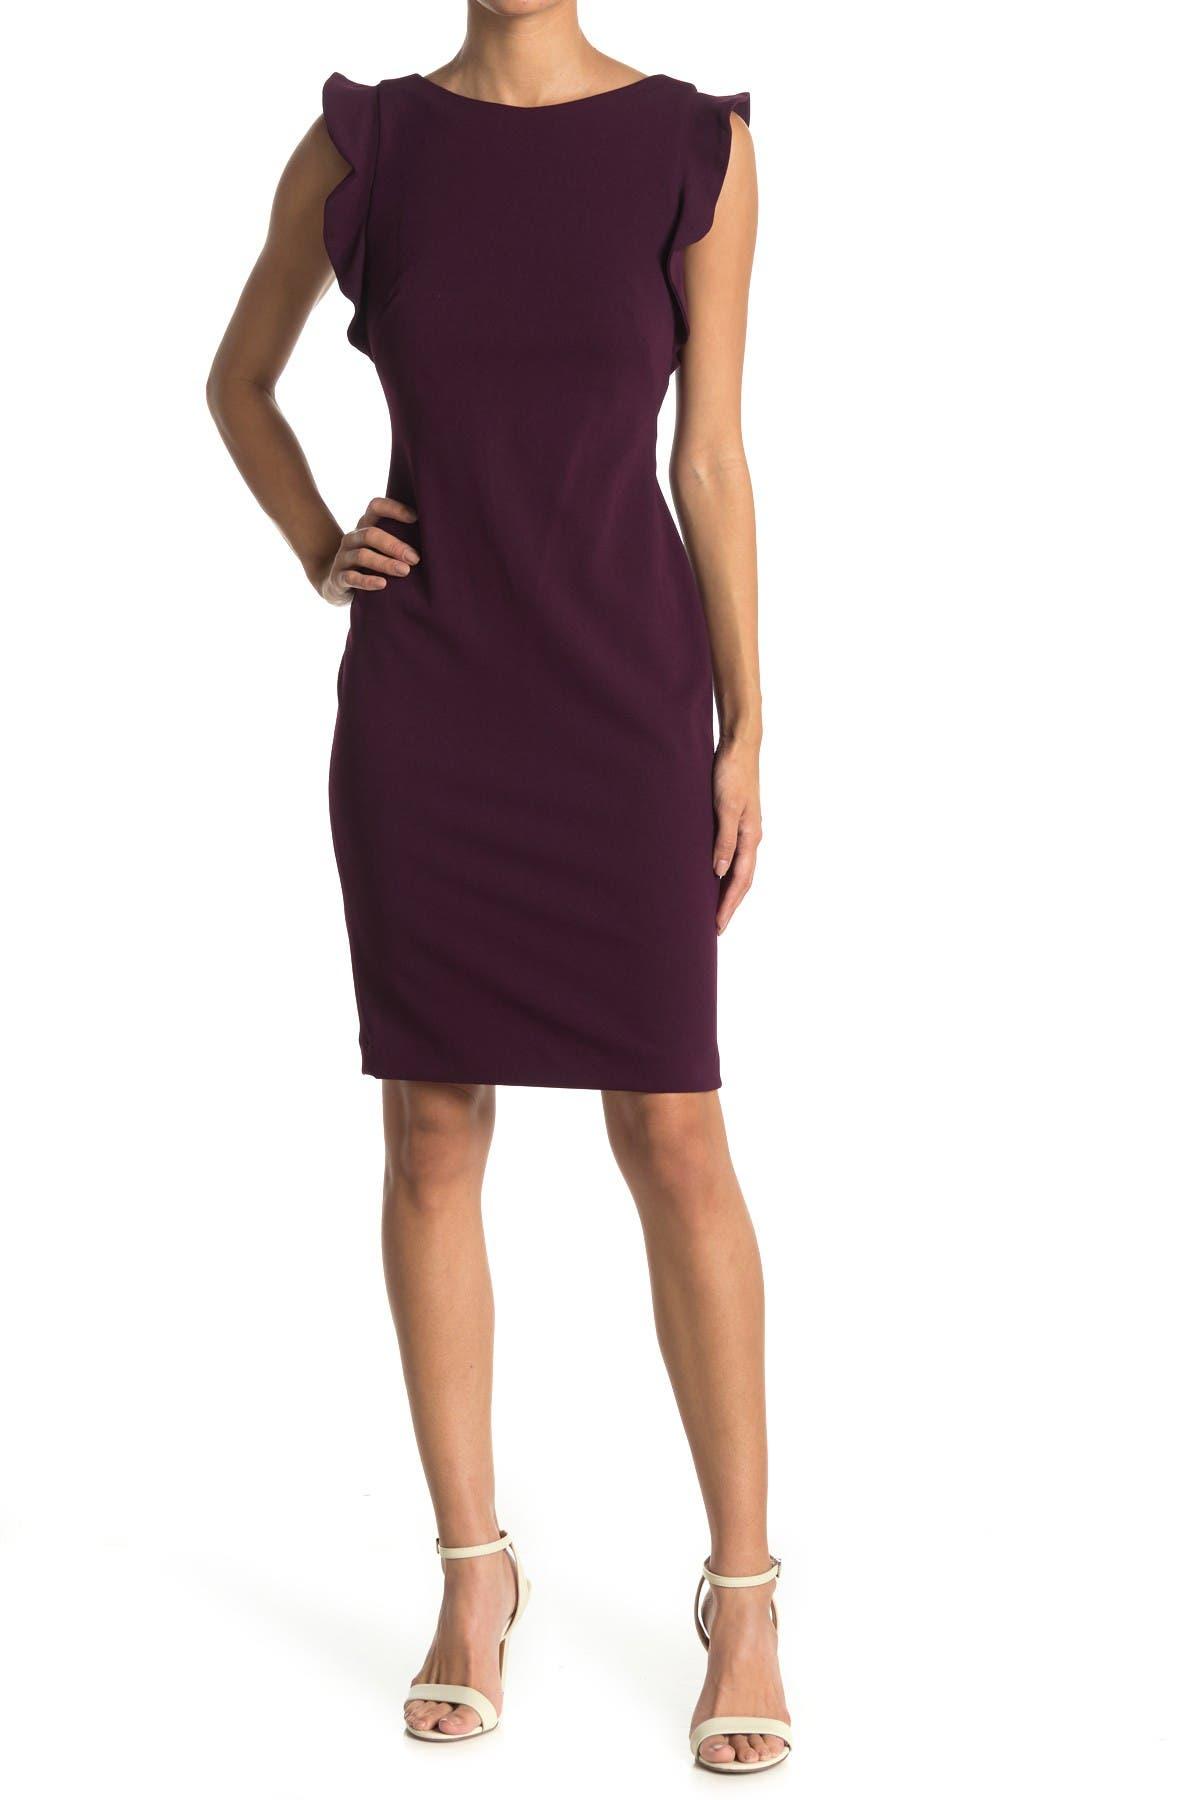 Image of Calvin Klein Ruffle Accent Sheath Dress